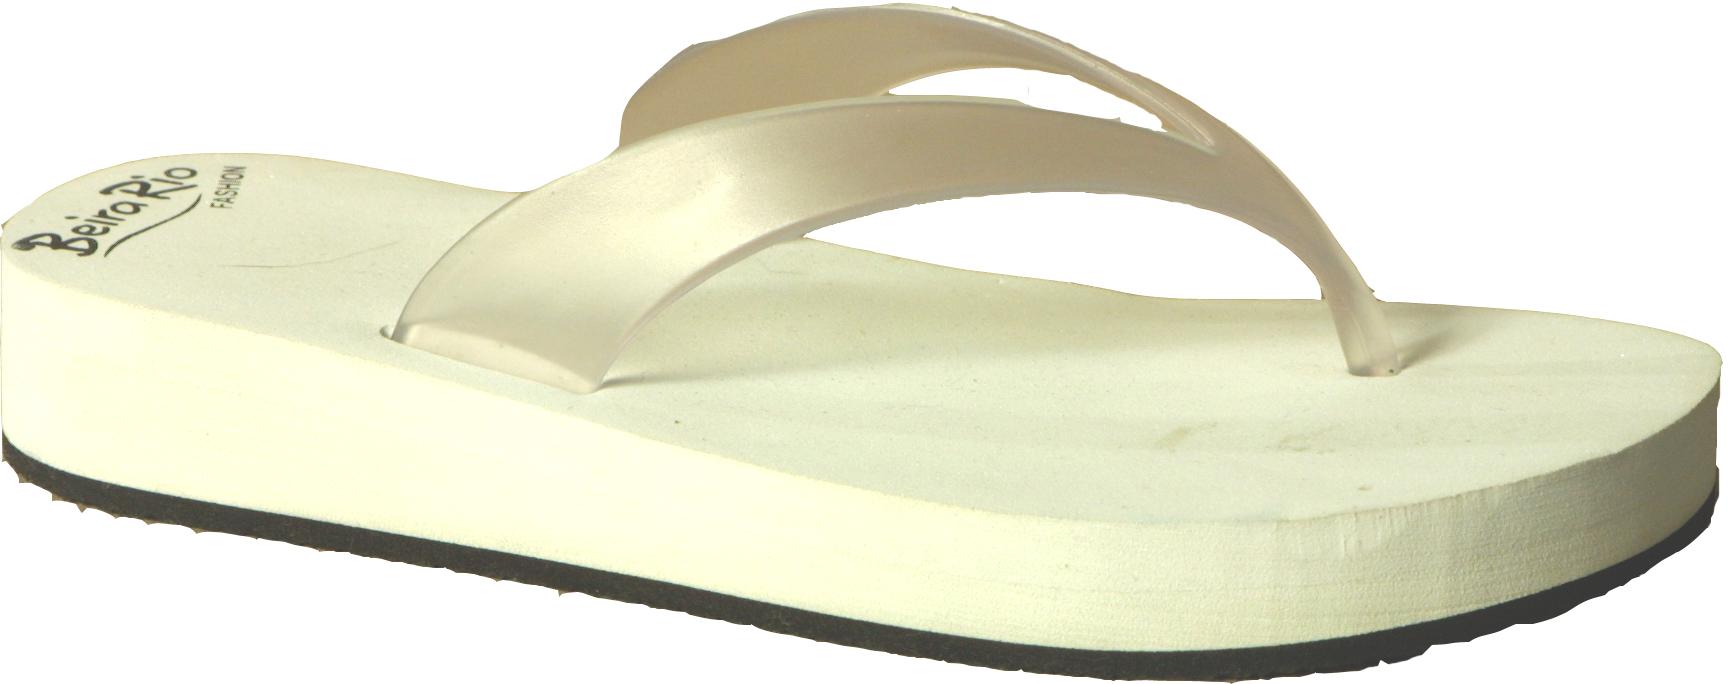 Aquarela Women's Flip Flops Style 223-403